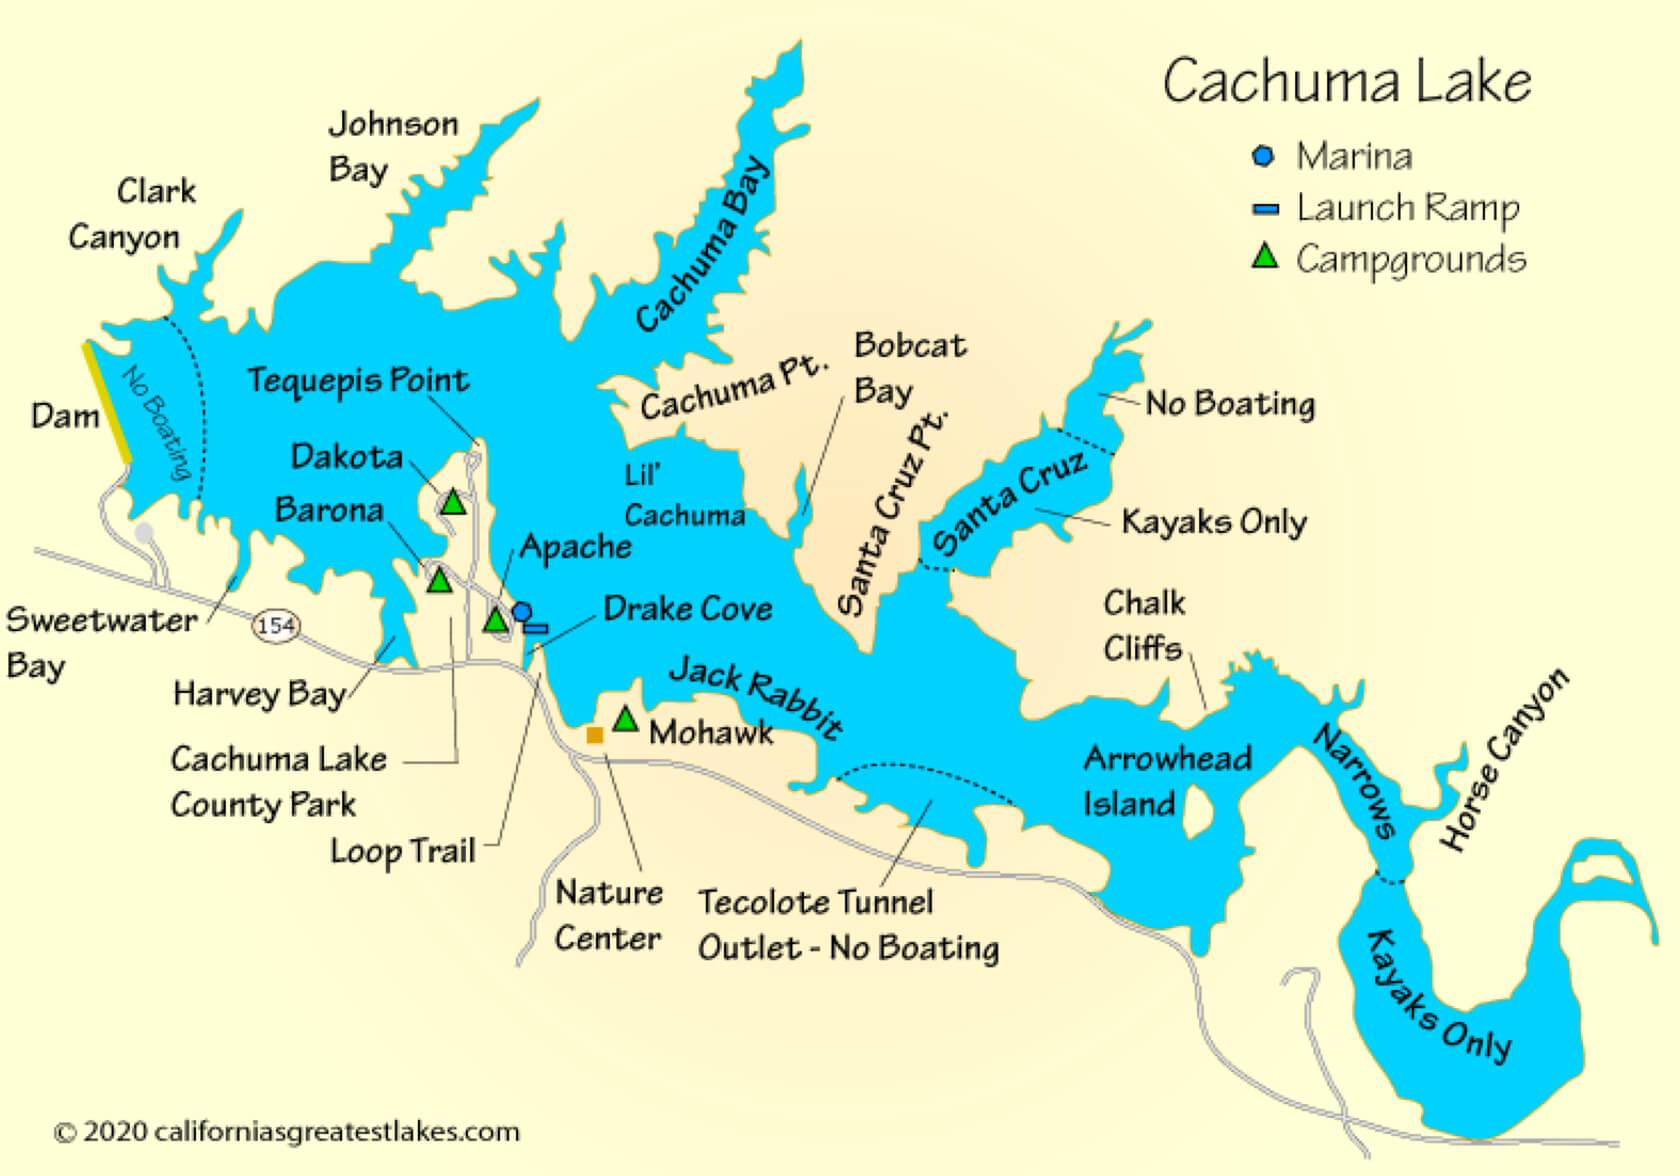 Cachuma-Lake-fishing-guide-Map-report-santa-barbara-ca-07